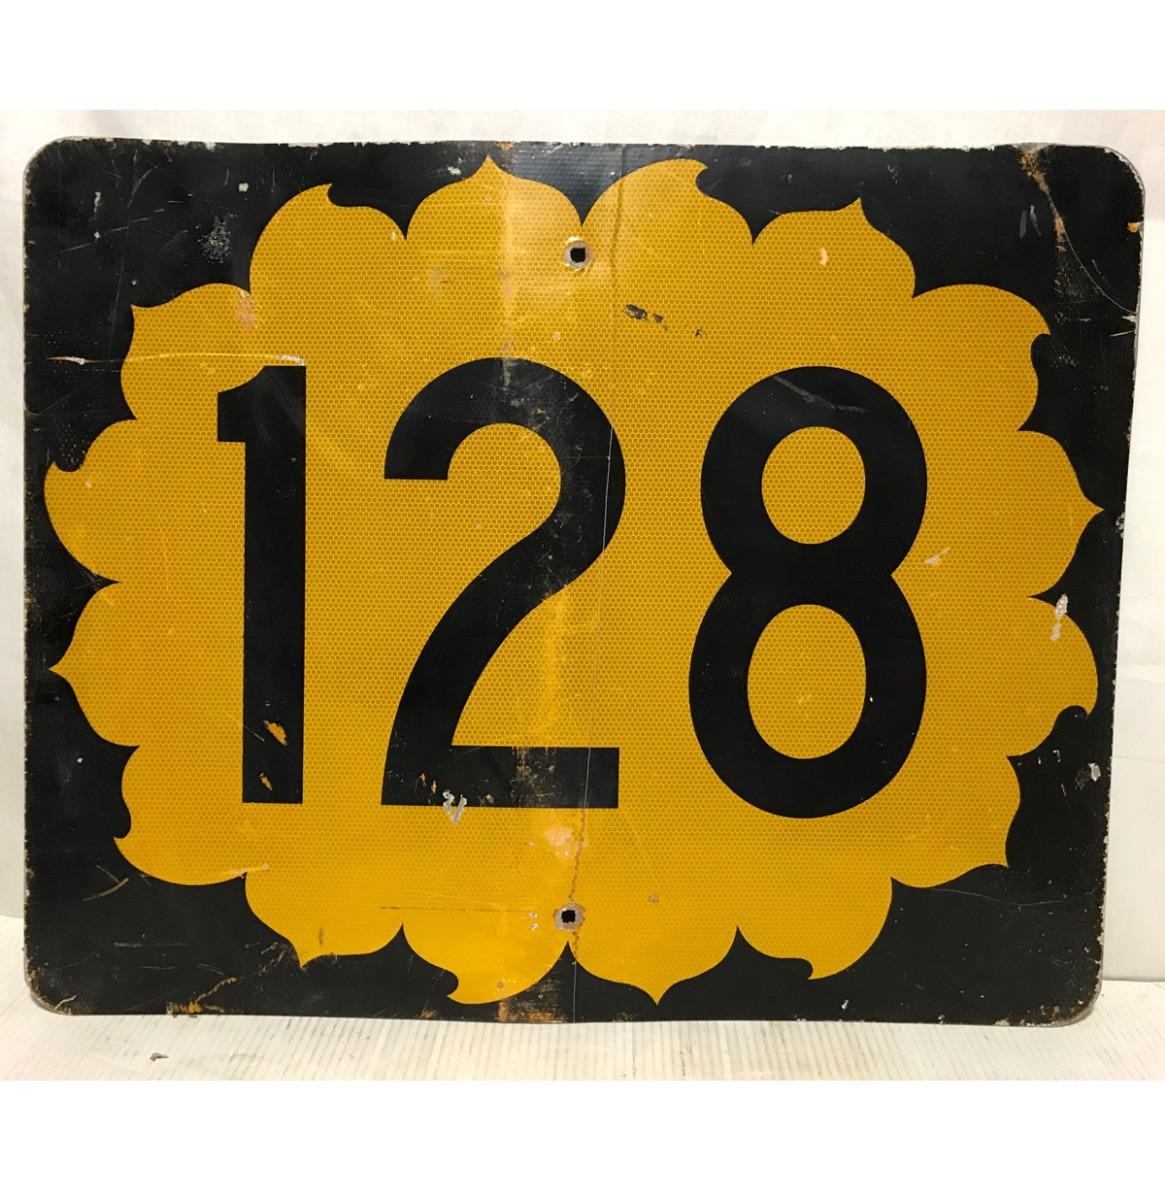 California Route 128 Highway Origineel Straatbord